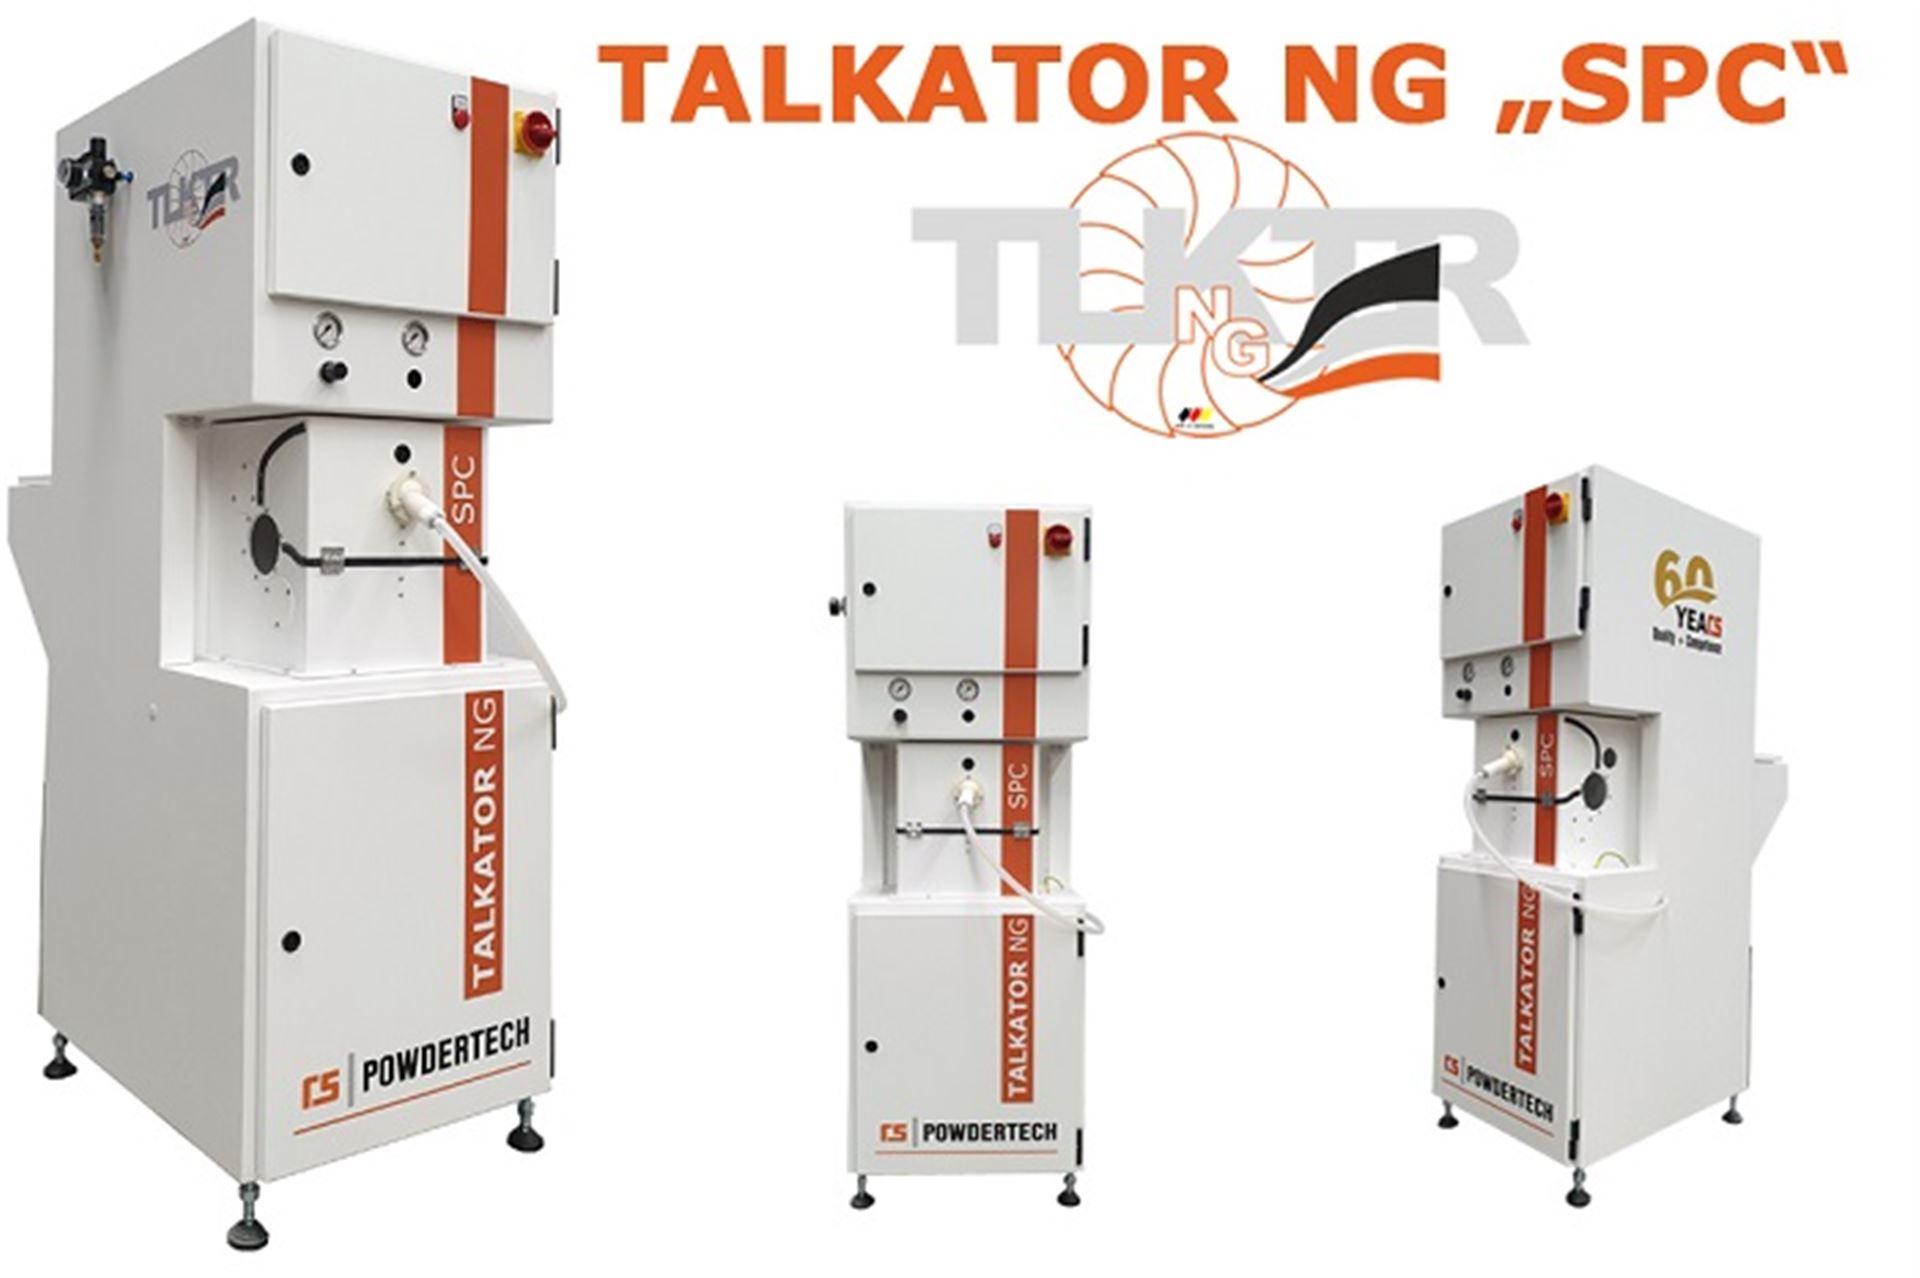 ROLF SCHLICHT GmbH - RS POWDERTECH Bepuderungsmaschine - Typ TALKATOR NG SPC +  DR